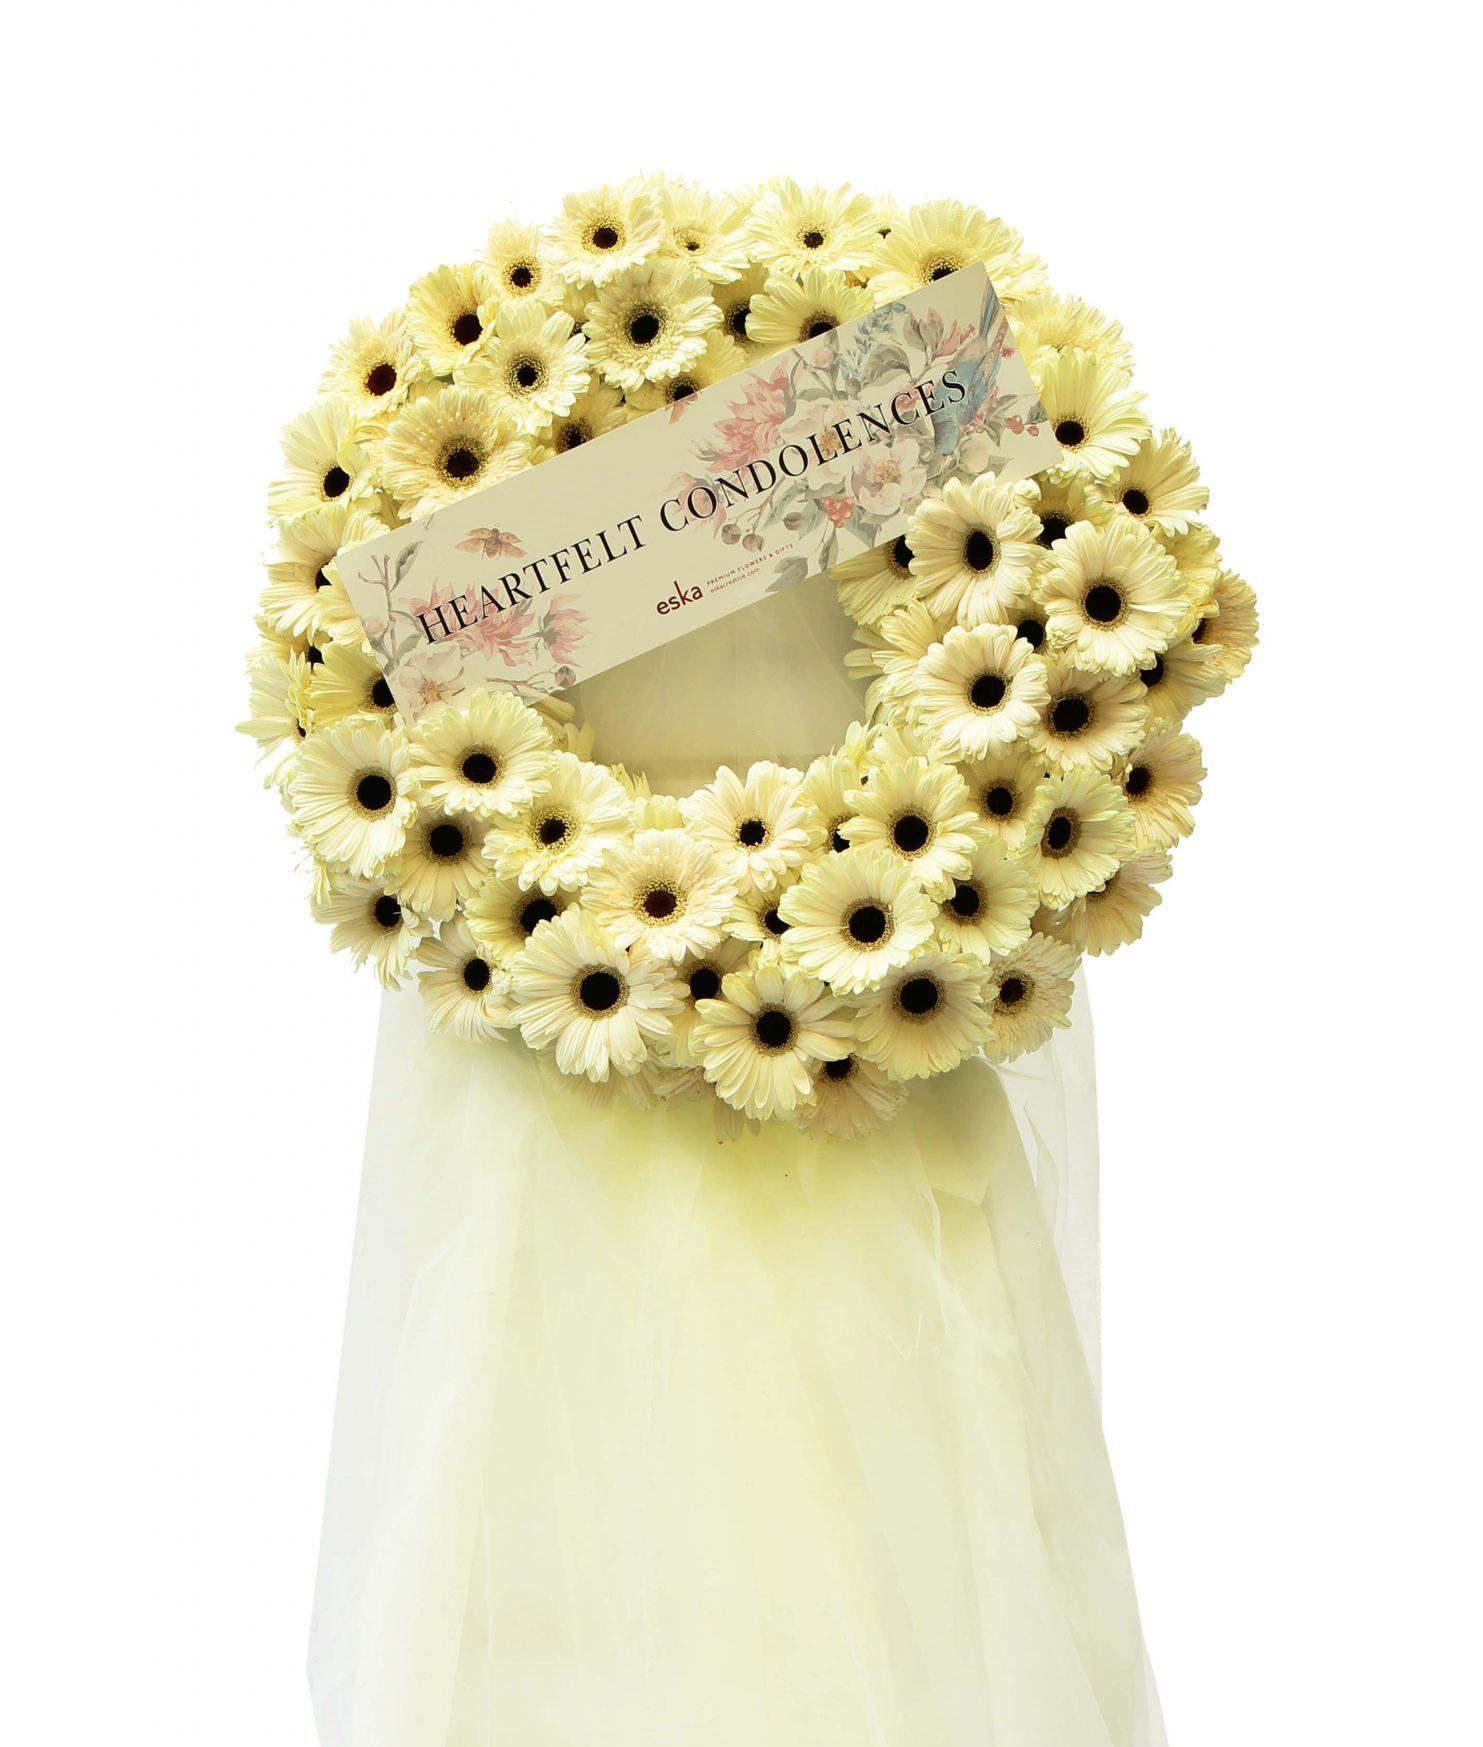 Graceful Funeral Flower Stand | Condolence Flower | Eska Creative Gifting